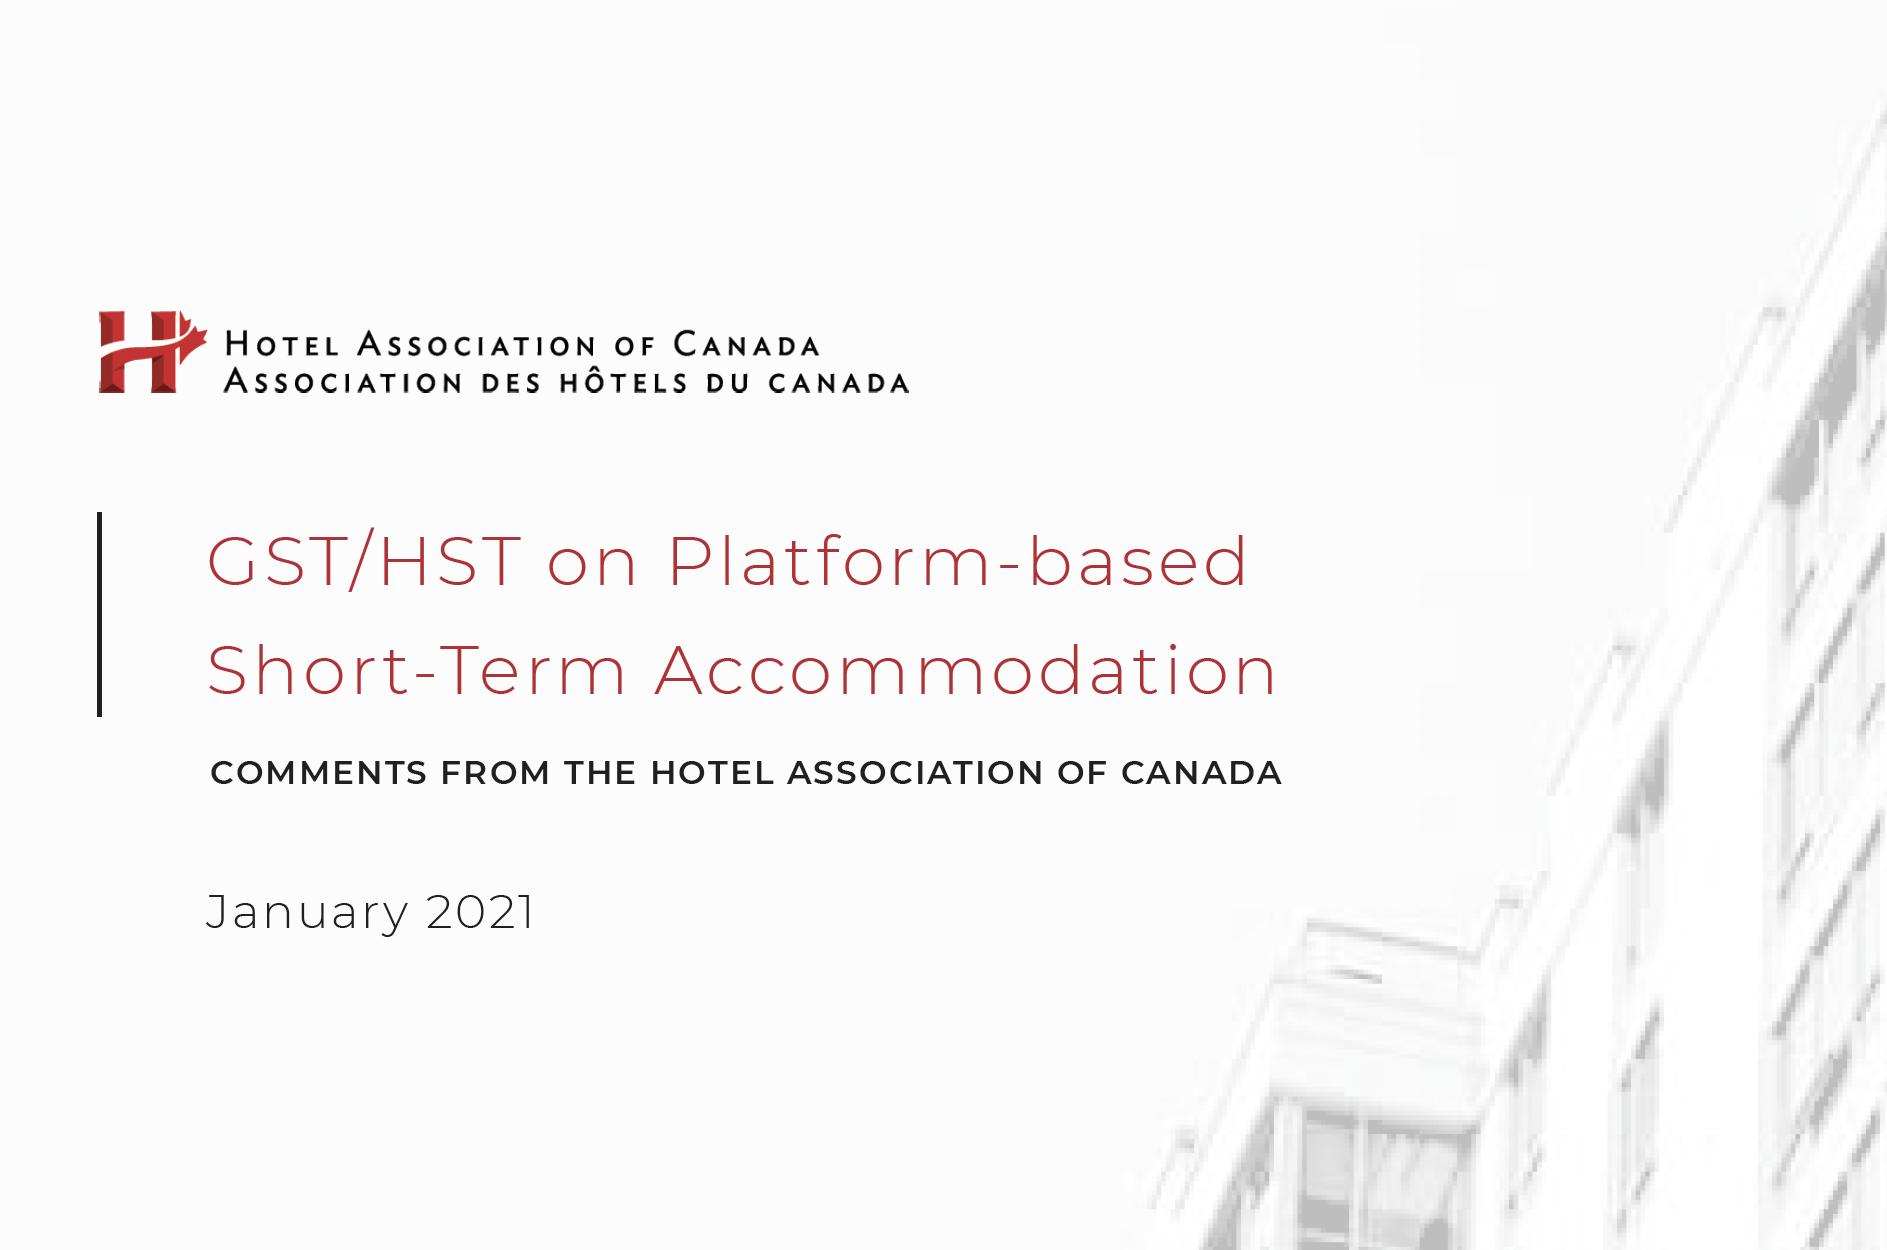 GST/HST on Platform-based Short-Term Accommodation